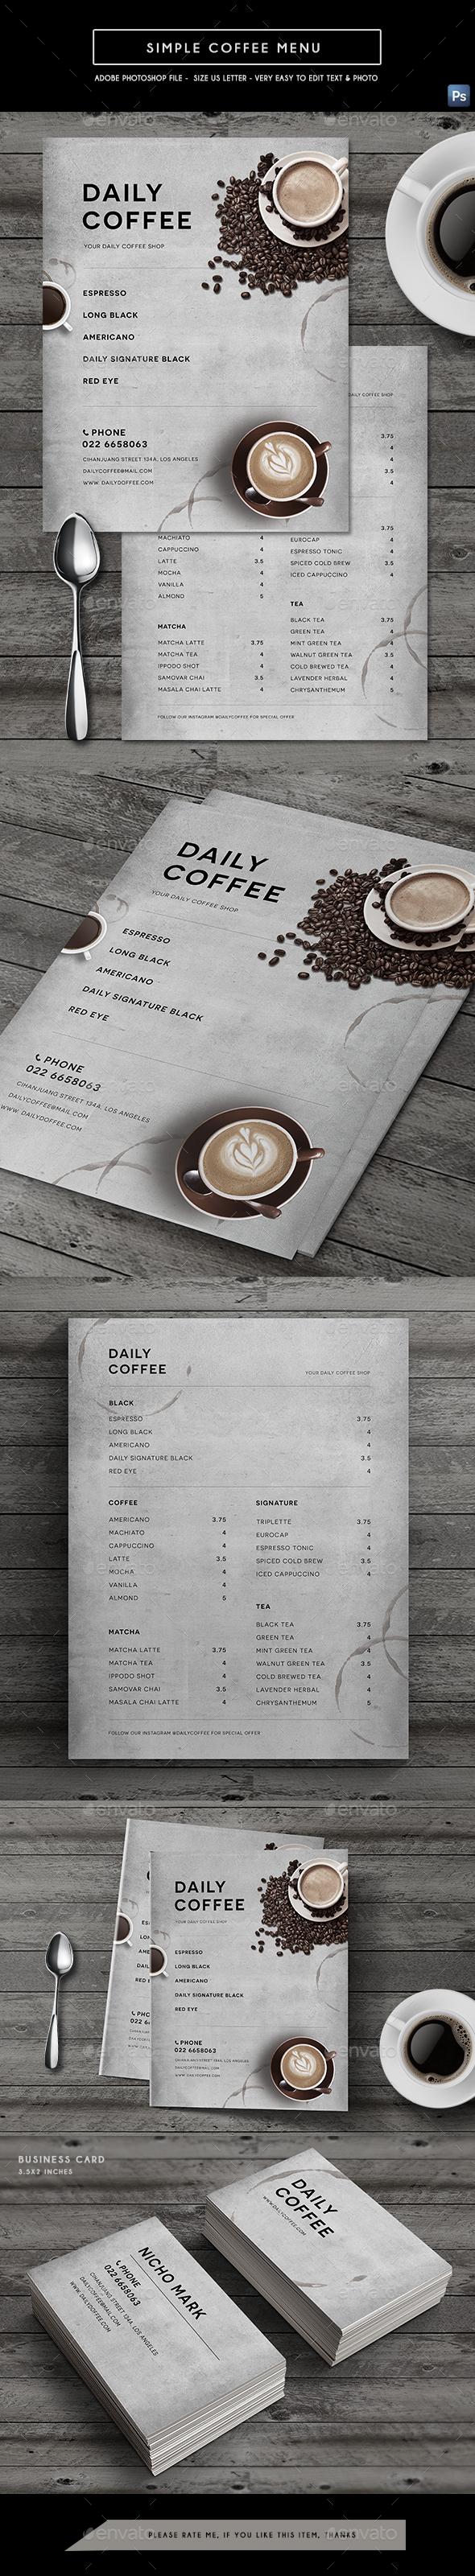 Simple Coffee Menu - Food Menus Print Templates